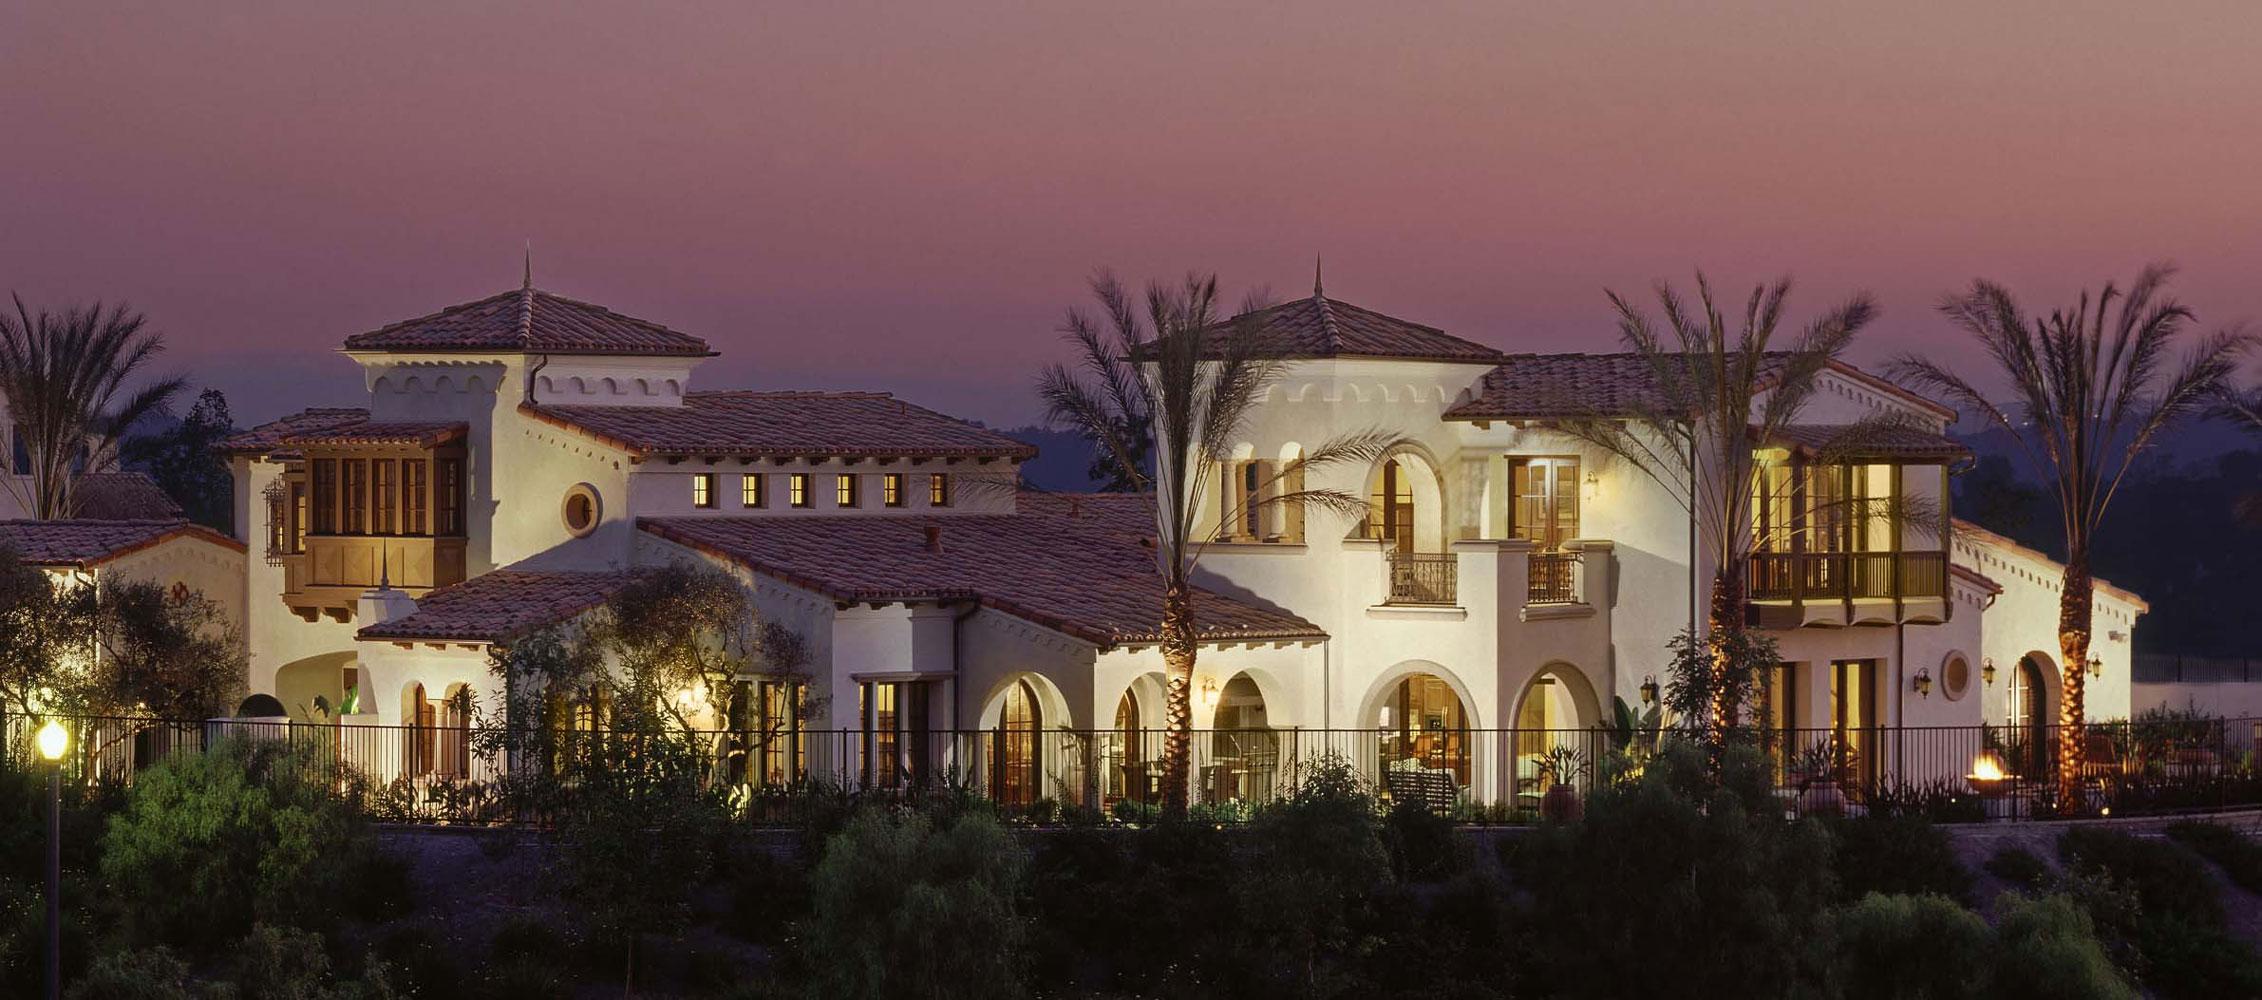 Contemporary-Spanish-Colonial-Exterior-Facade-Dusk-Corbin-Reeves.jpg